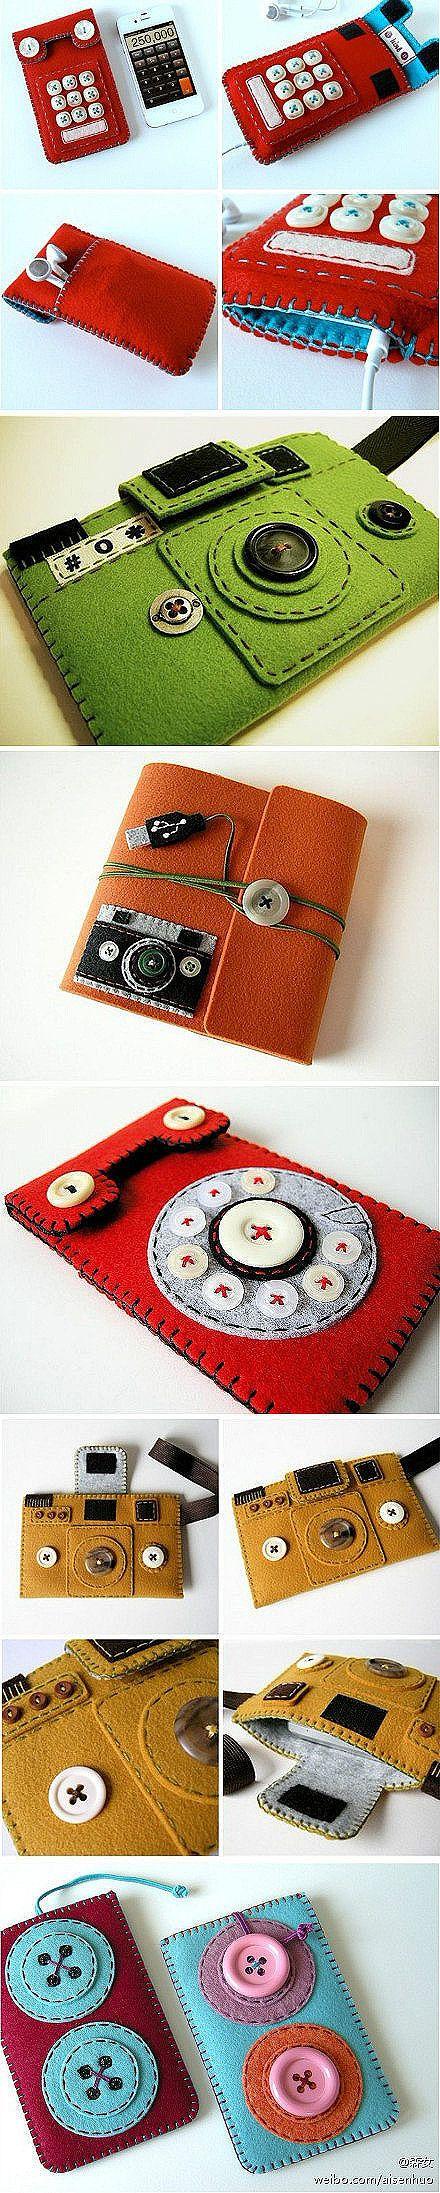 Cute cell phone cases! 手机套-嘀咕网 - 收集高清唯美图片视频,分享你所爱,结识心朋友